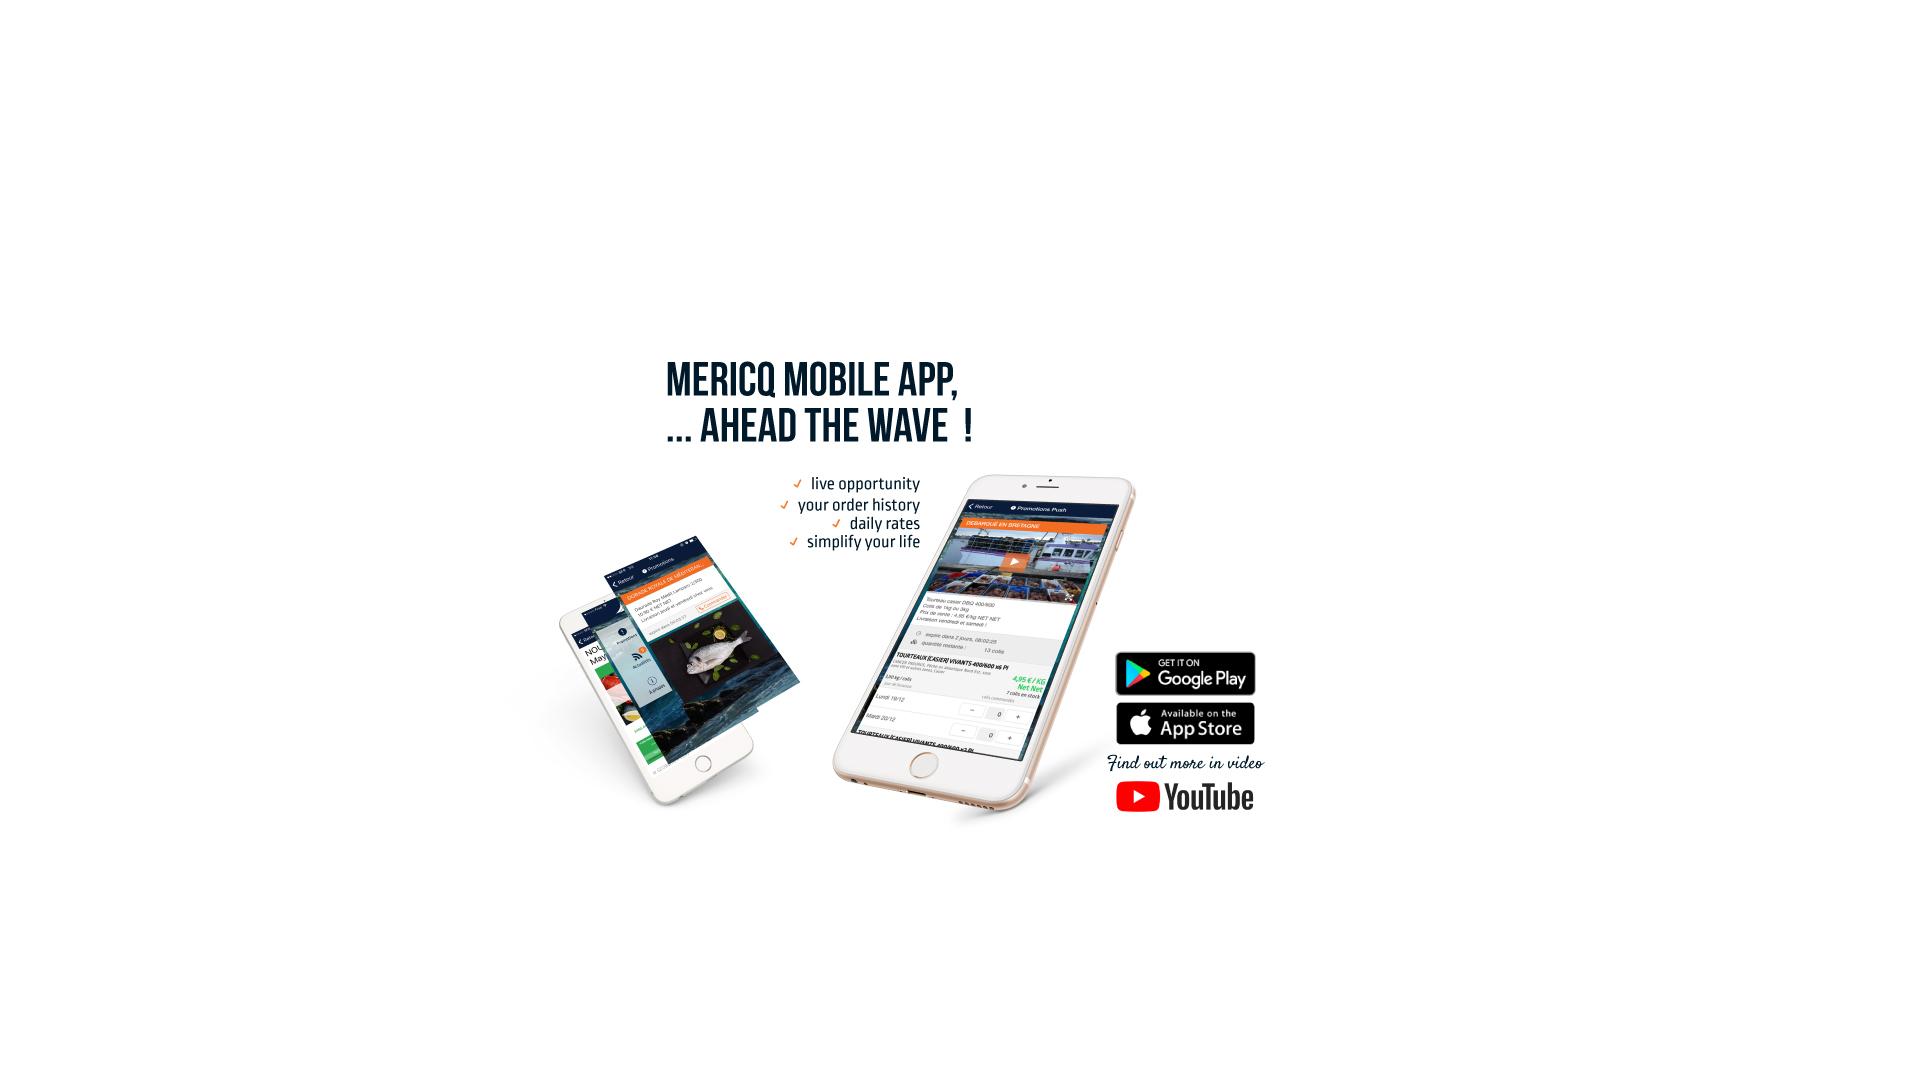 Mericq mobile app